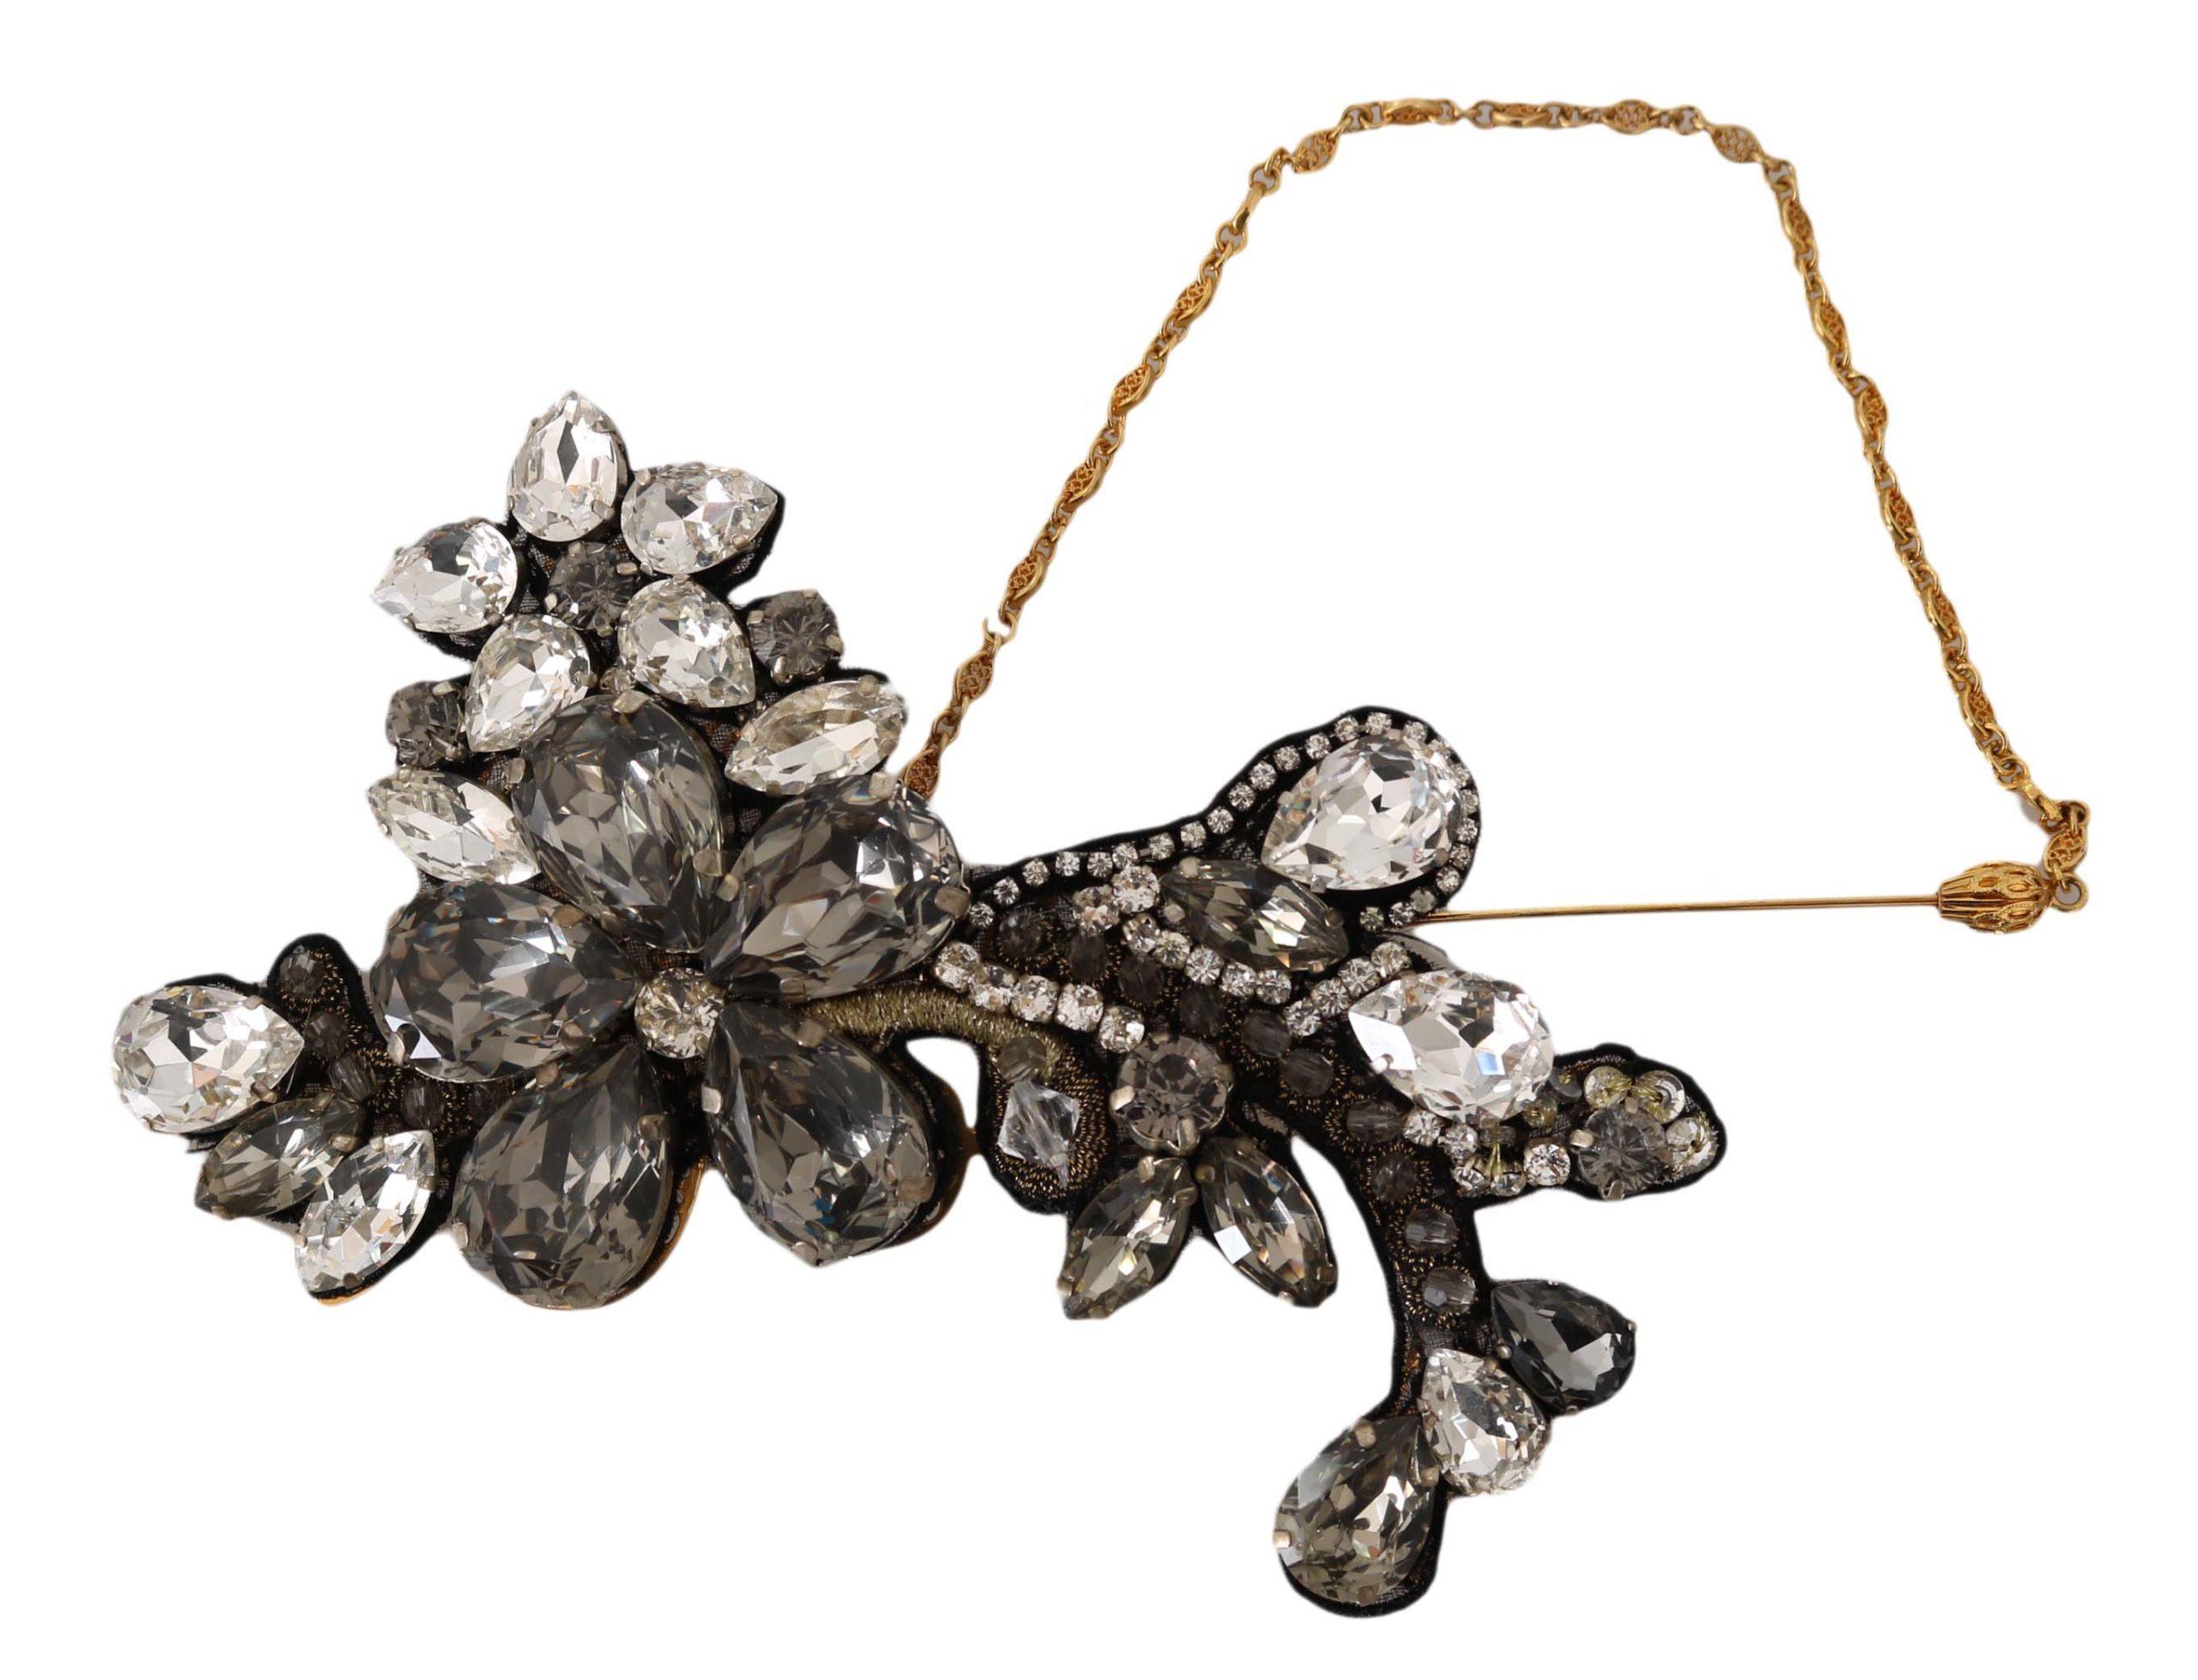 Dolce & Gabbana Women's Lapel Pin Chain Clear Gray Crystal Flower Brooch Gold SMYK1008